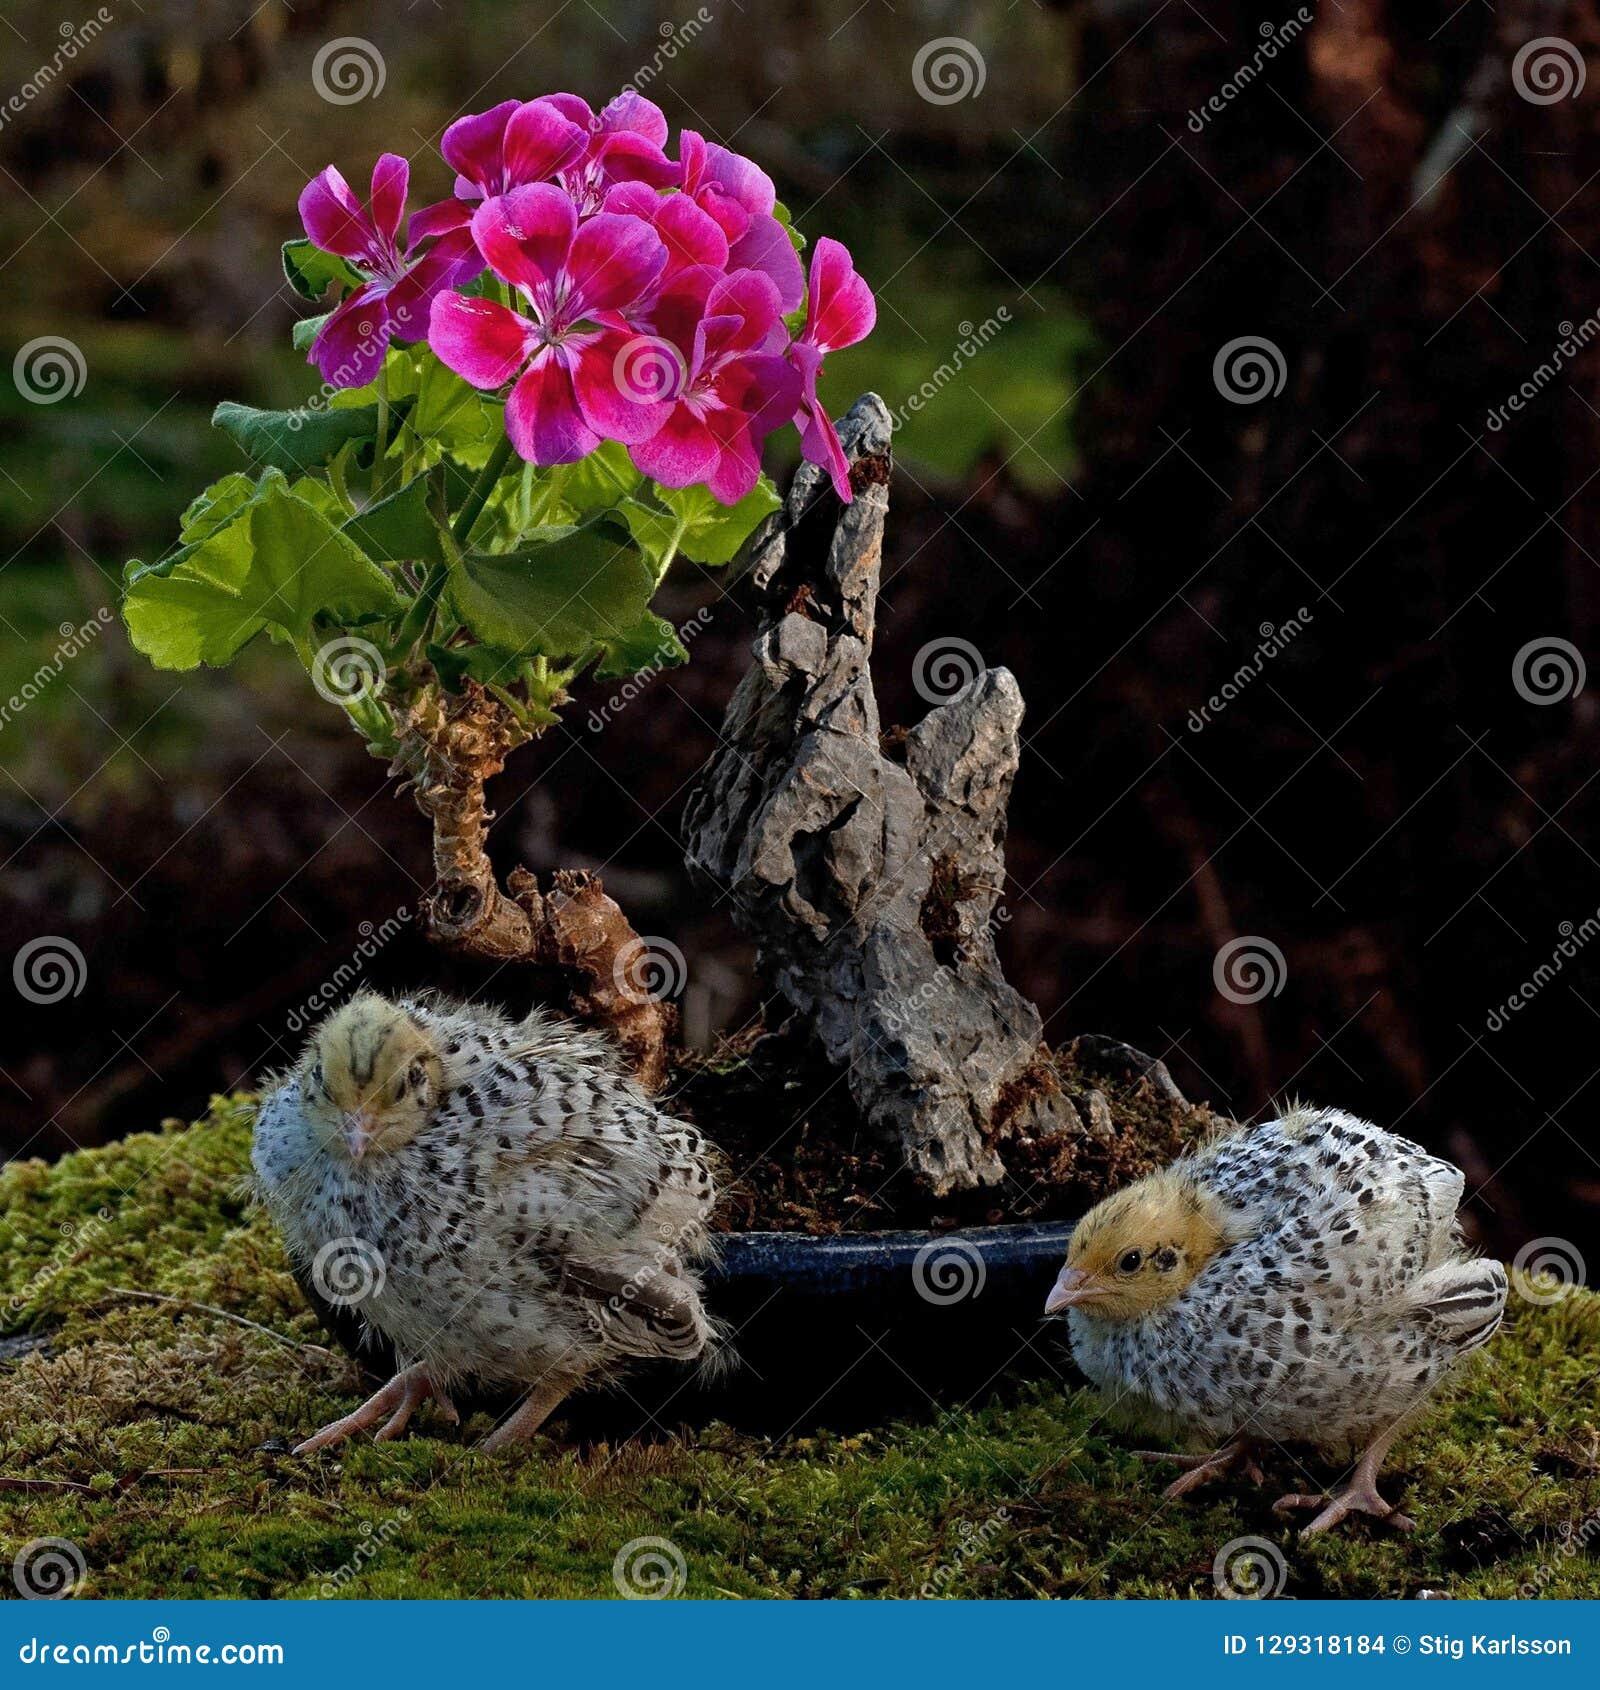 Eleven days old quail, Coturnix japonica.....near bonsai of a flowering geranium